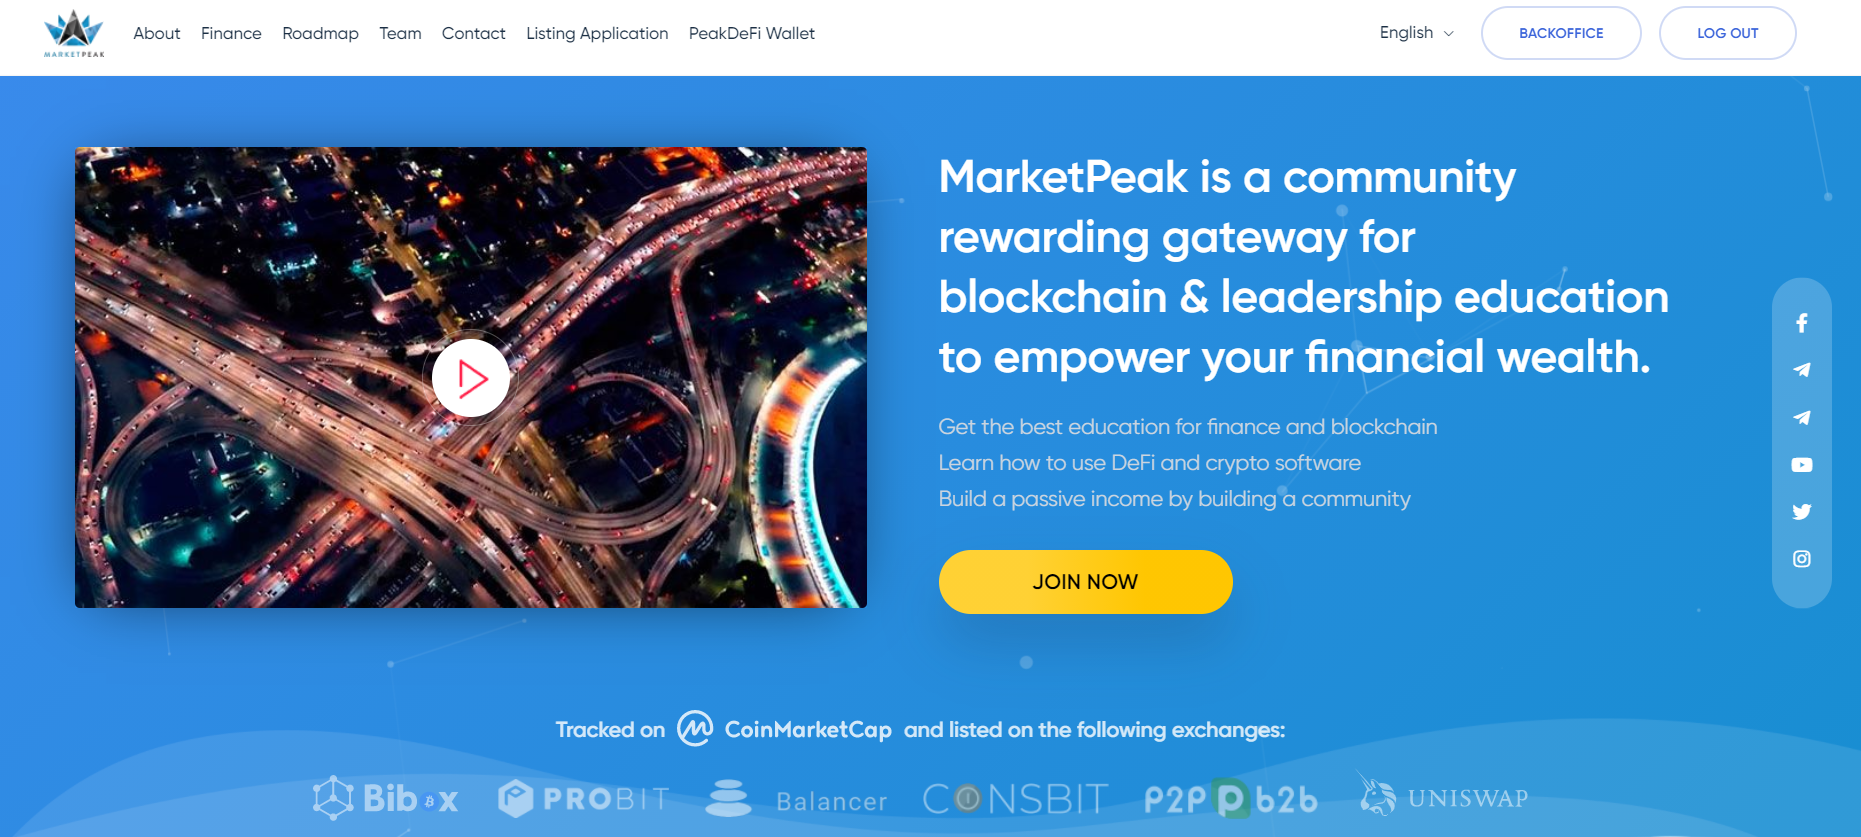 Marketpeak.comを確認してください-詐欺またはLEGIT?